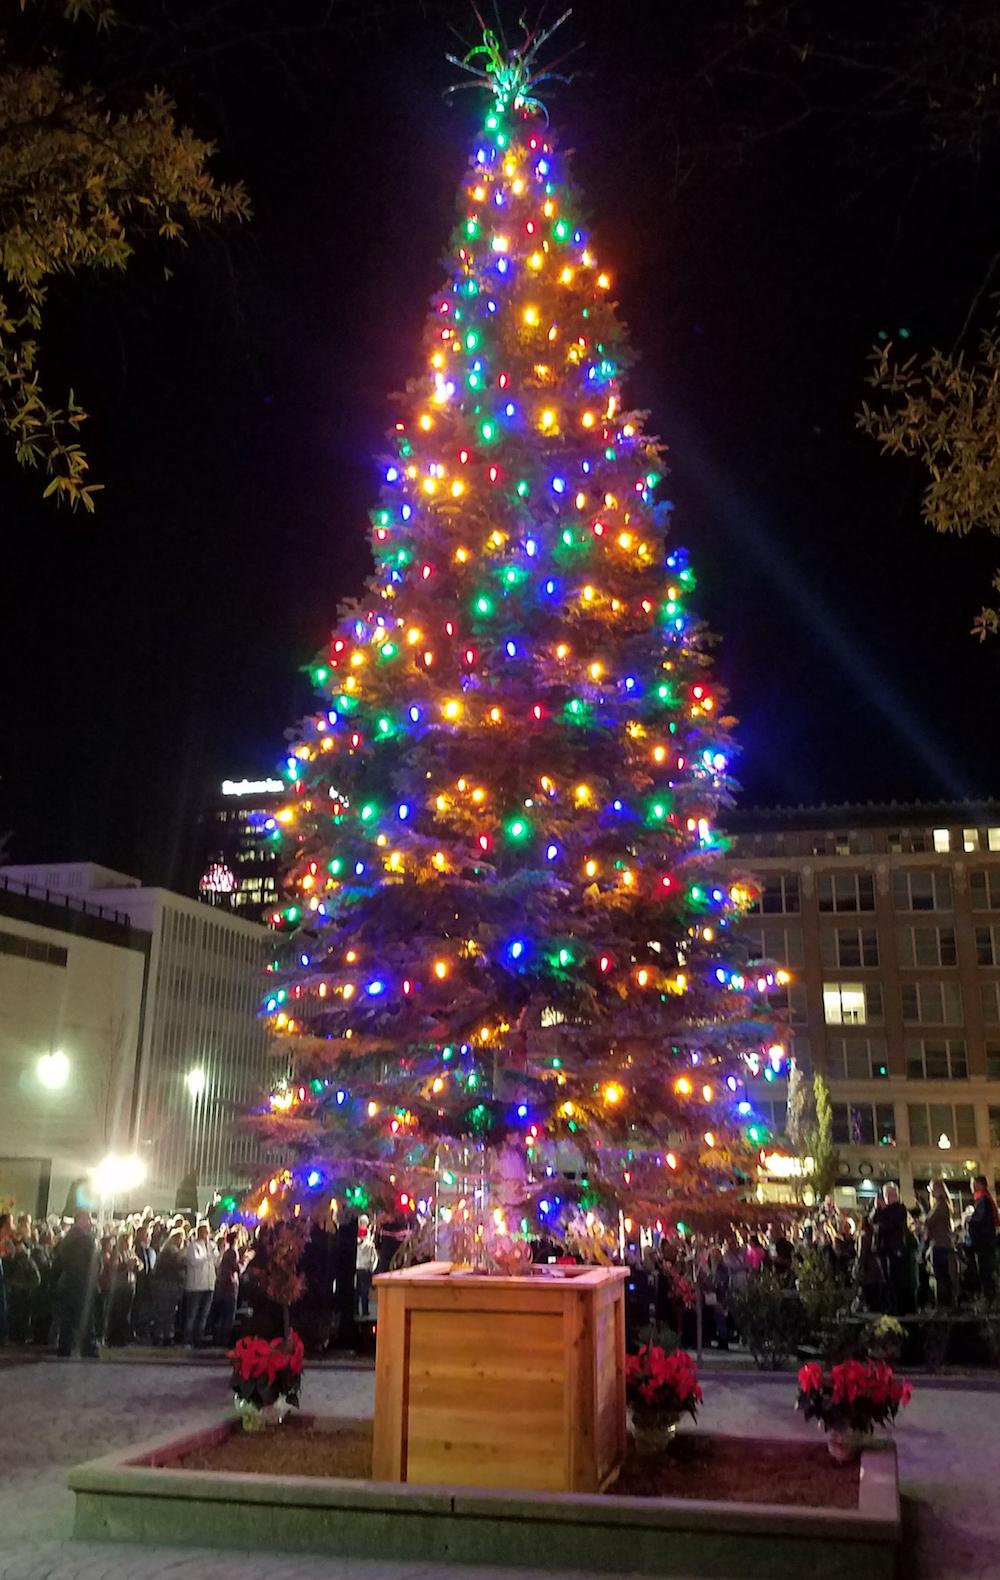 Downtown Conway Christmas 2020 Arkansas Interactive: Illuminate the Arkansas Christmas trees